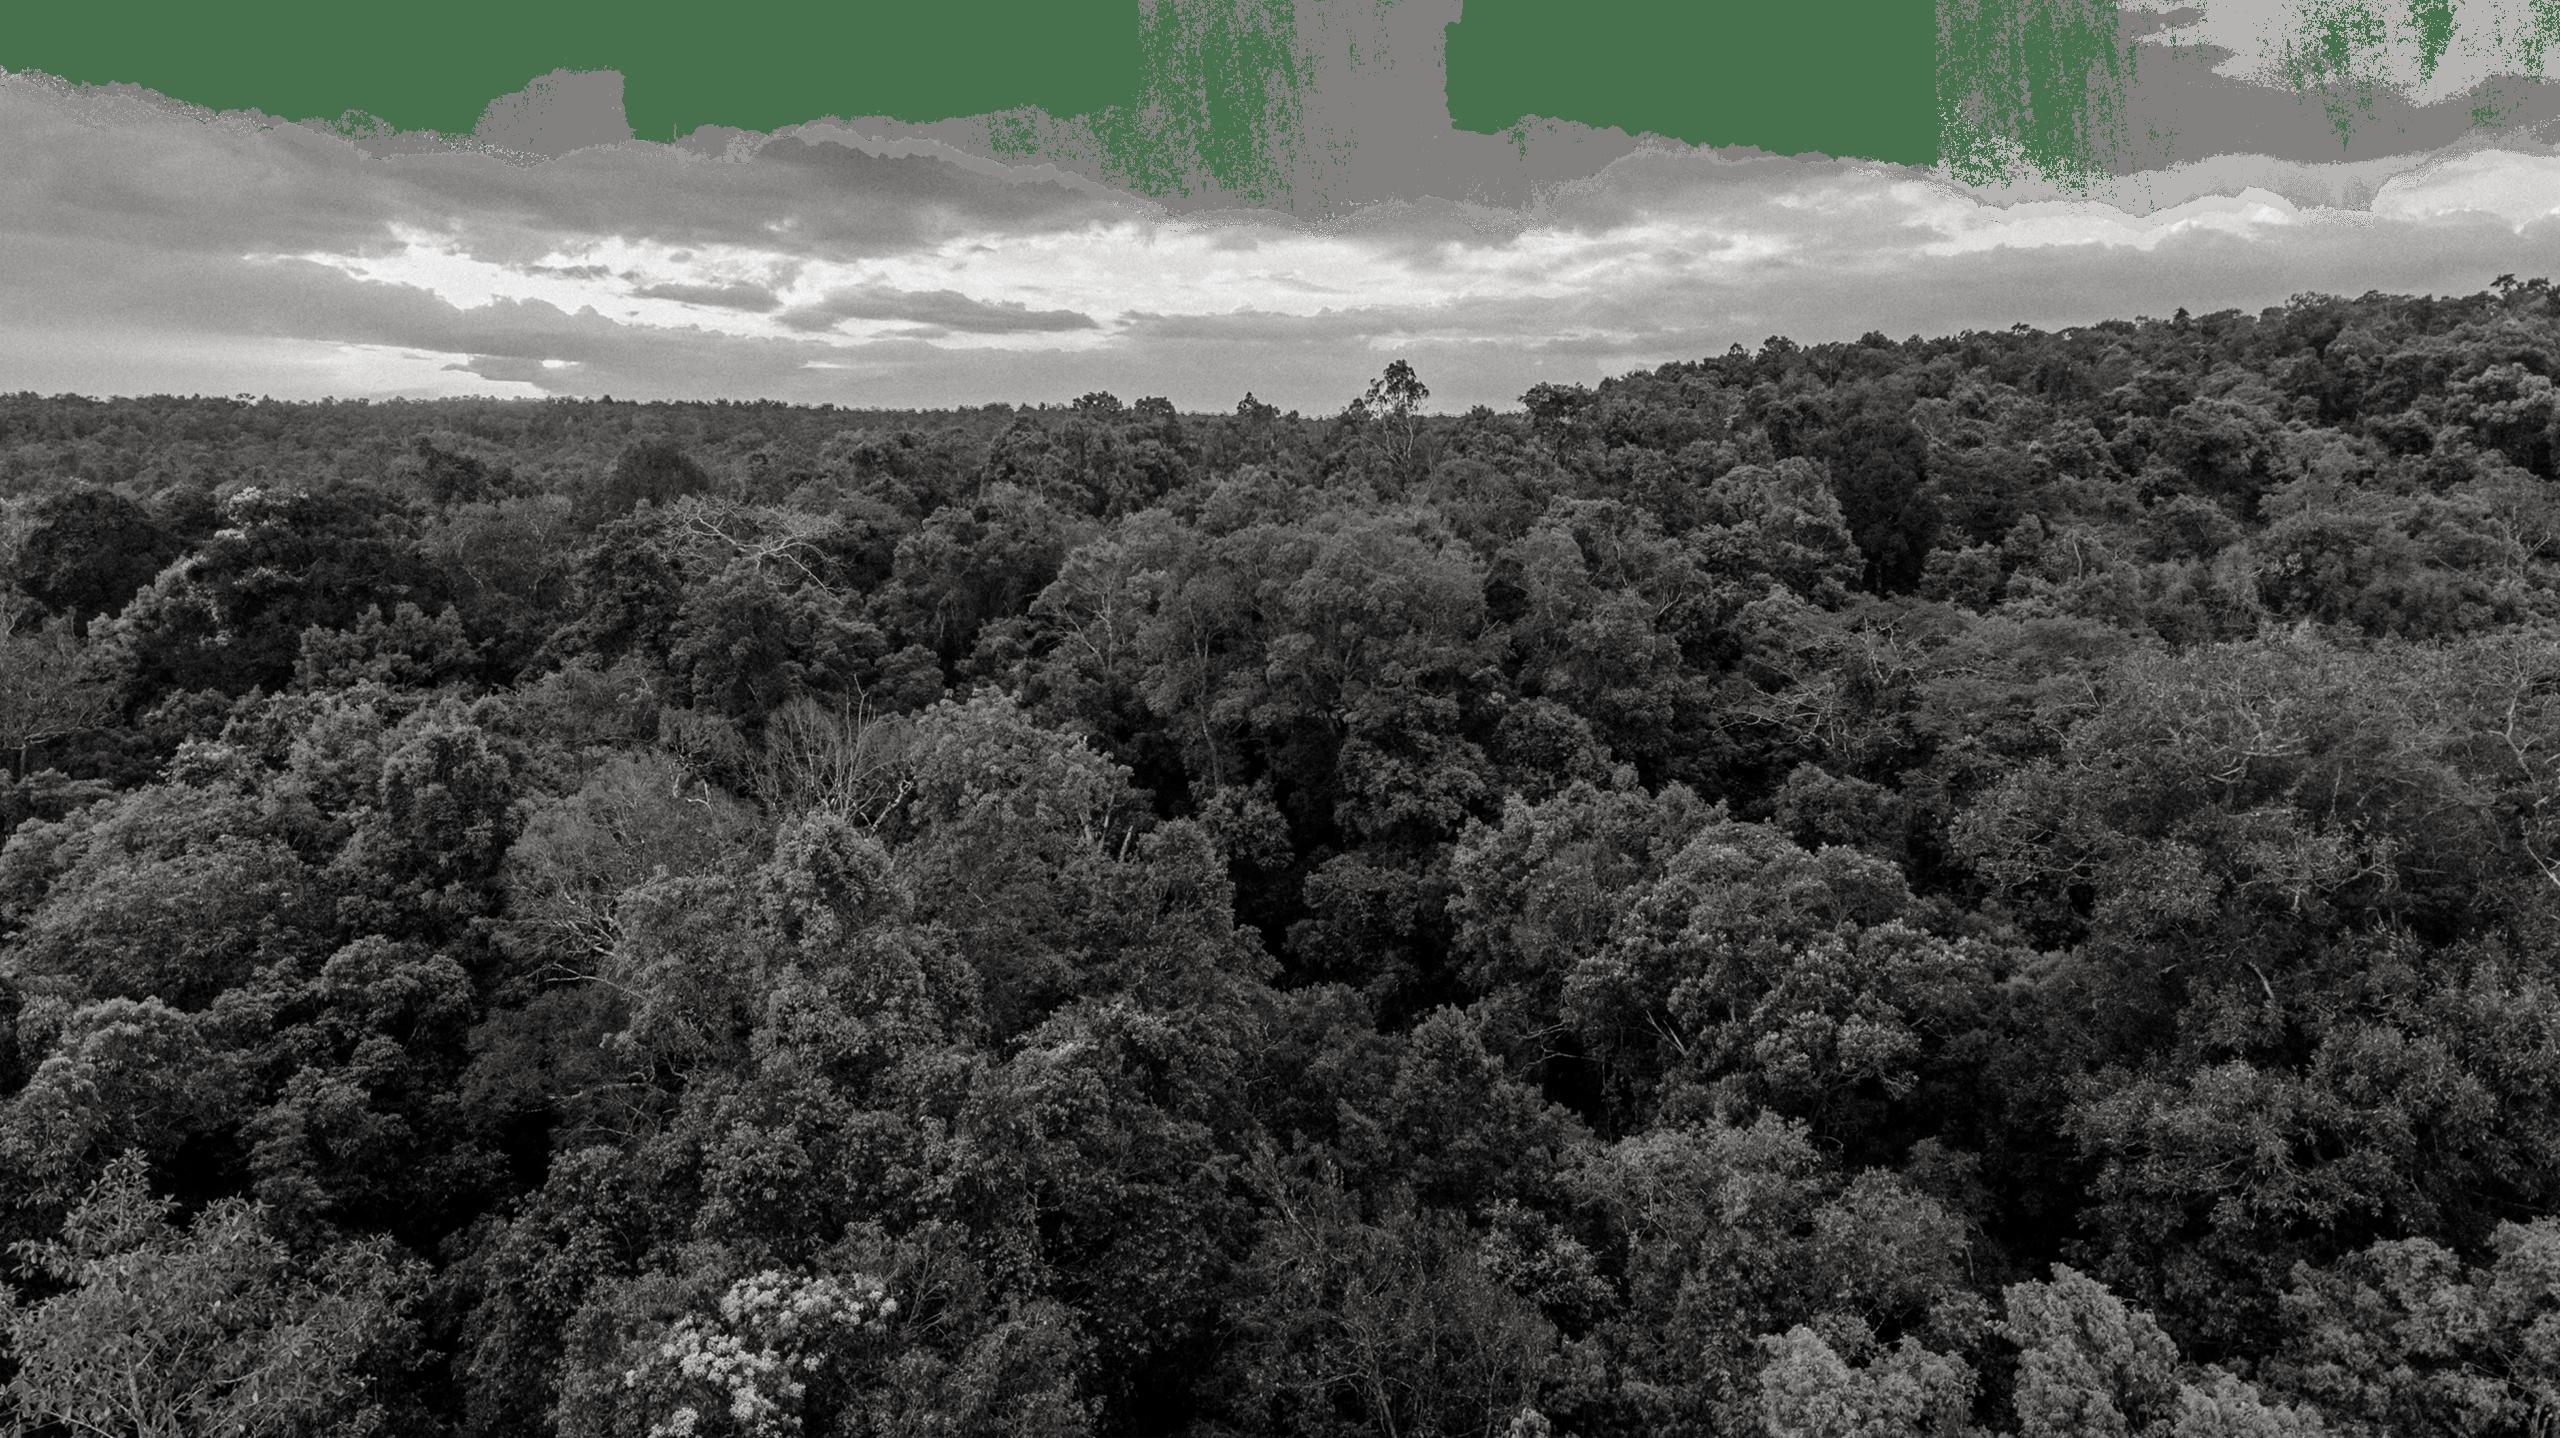 MANGROVE FORESTSP